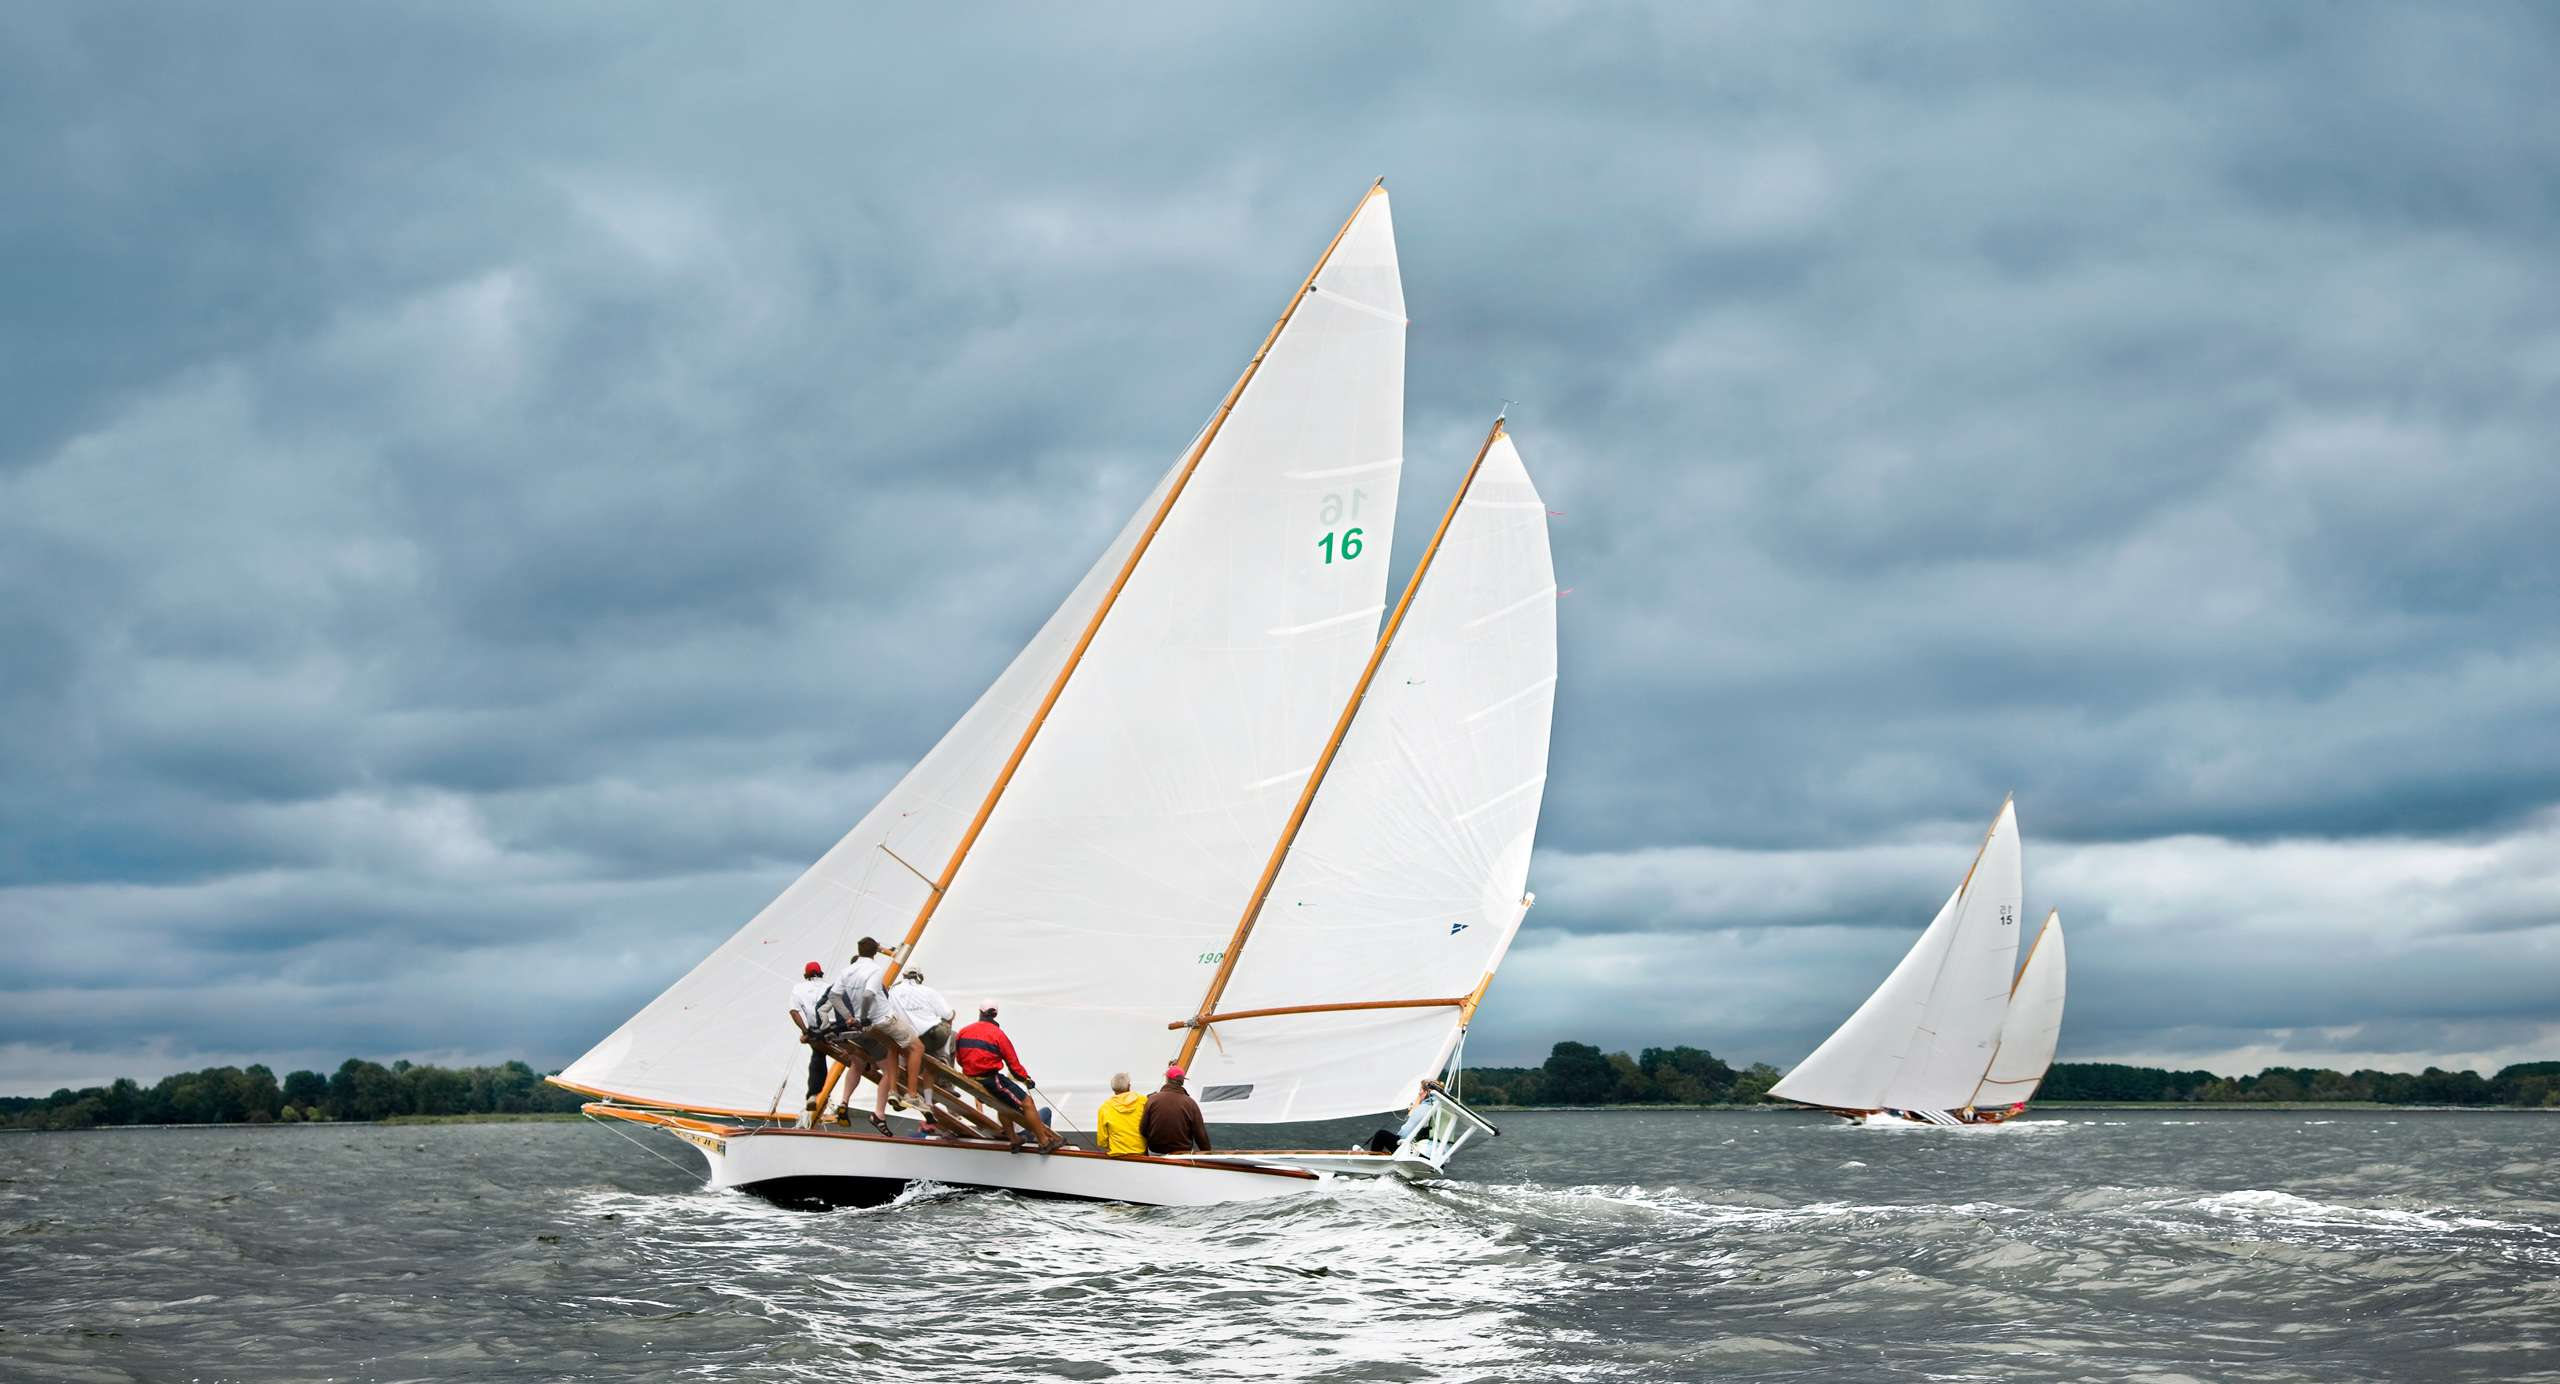 PORTFOLIO - Sailing - Log Canoes #14   PCG531